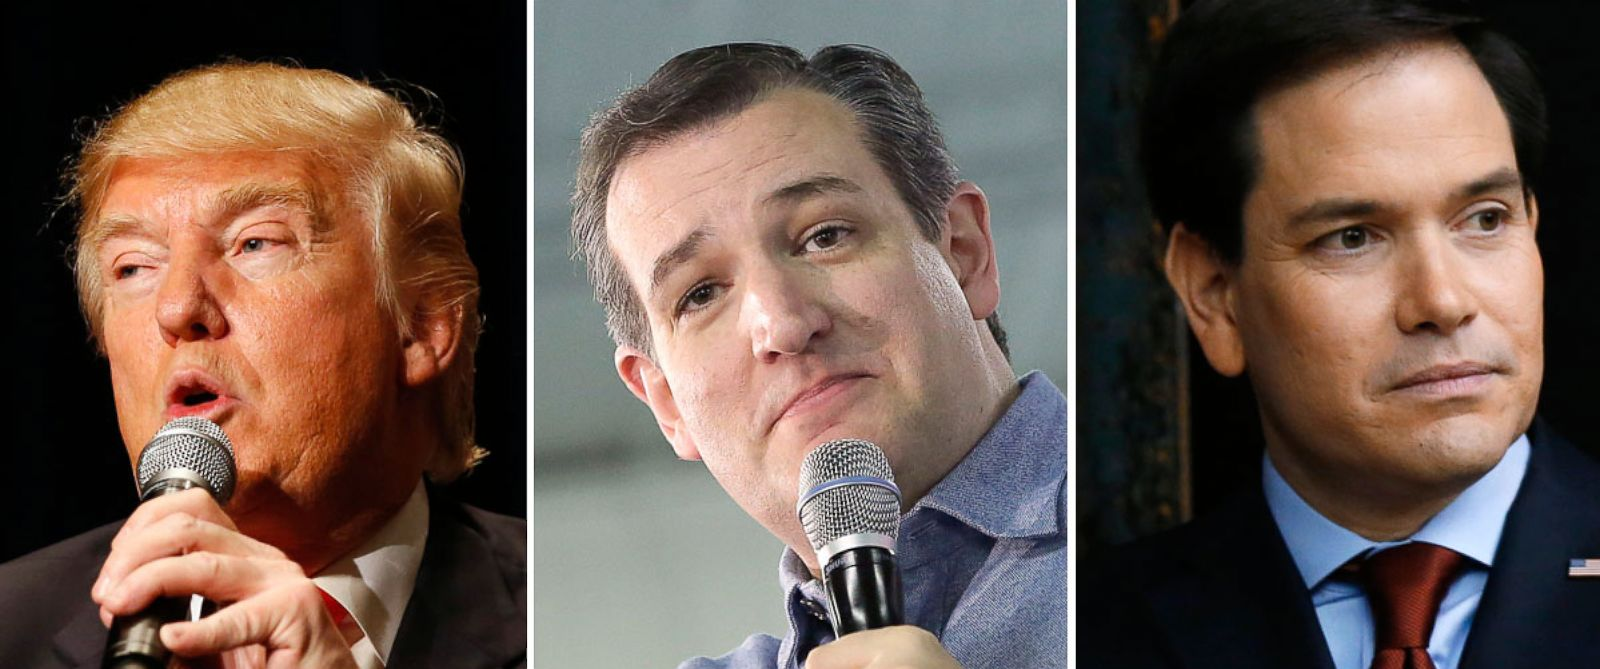 PHOTO: Donald Trump, Sen. Ted Cruz, and Sen. Marco Rubio.